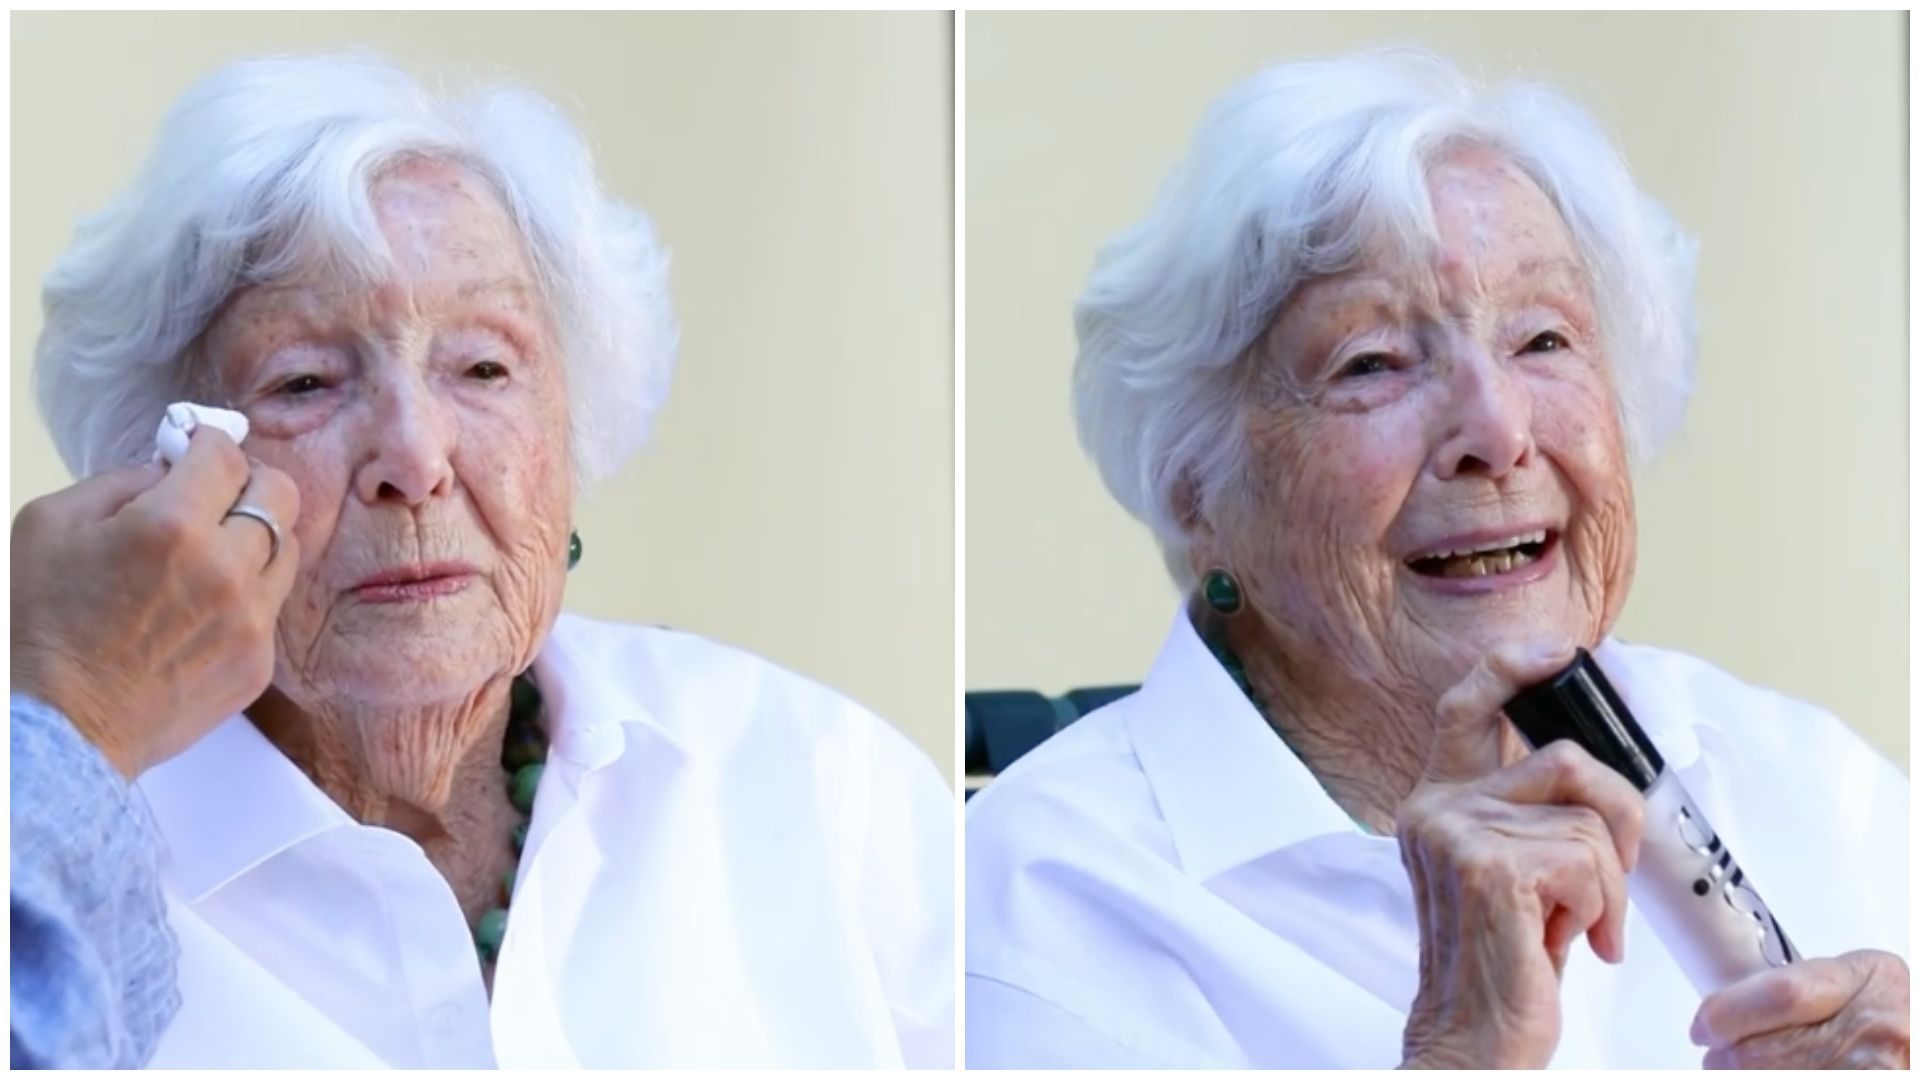 99 éves modell